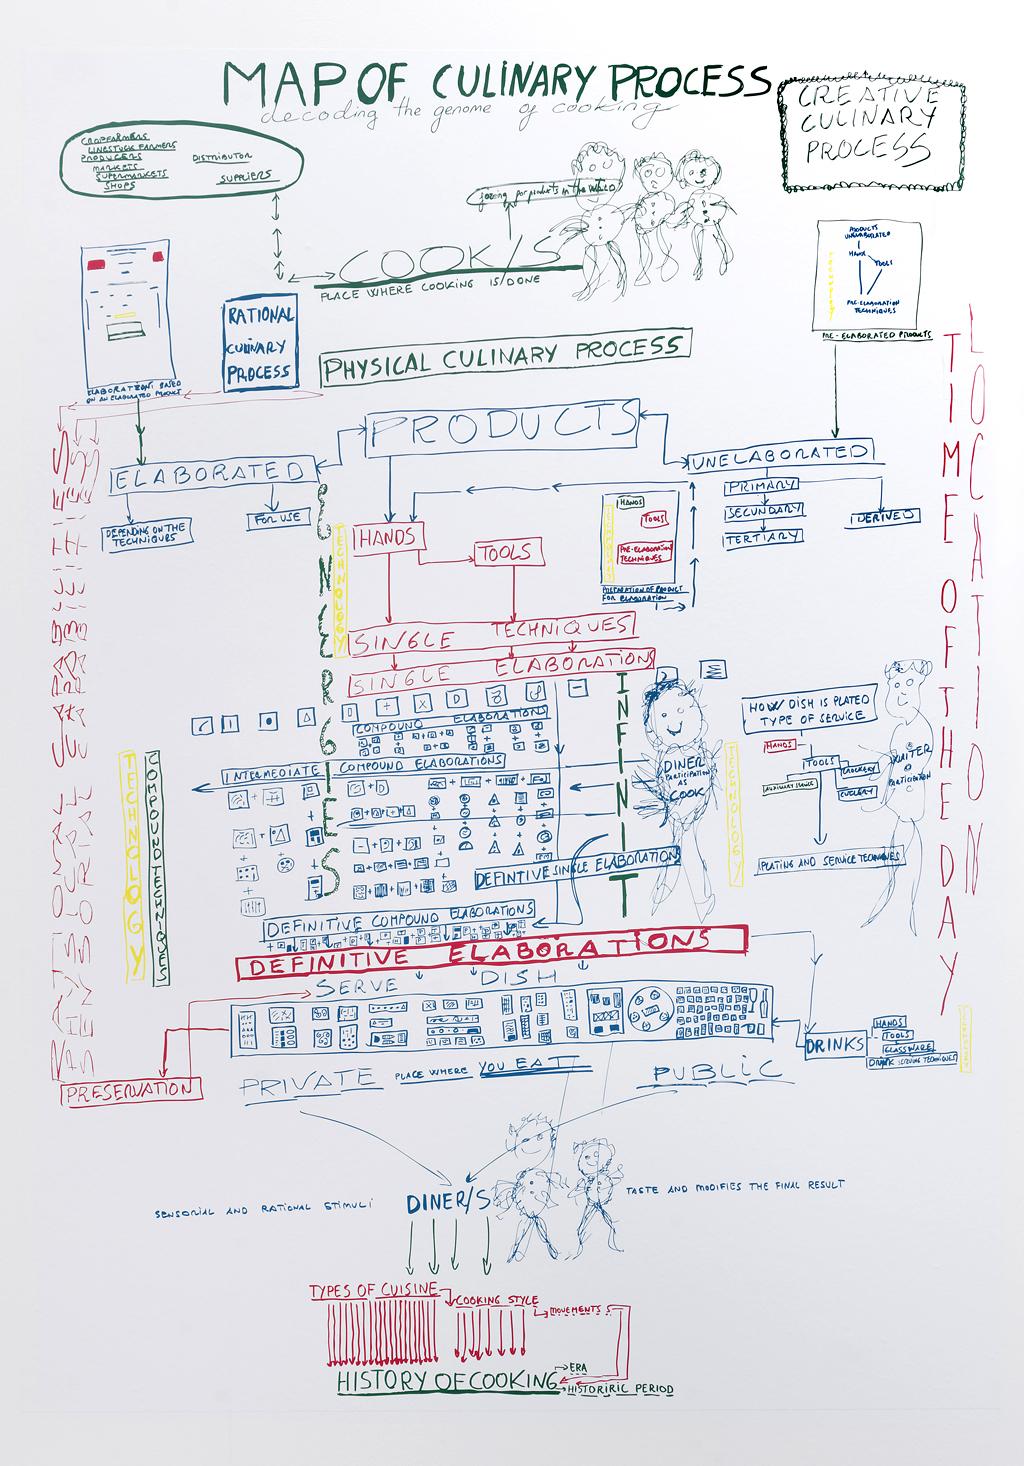 Ferran Adrià - Notes on Creativity